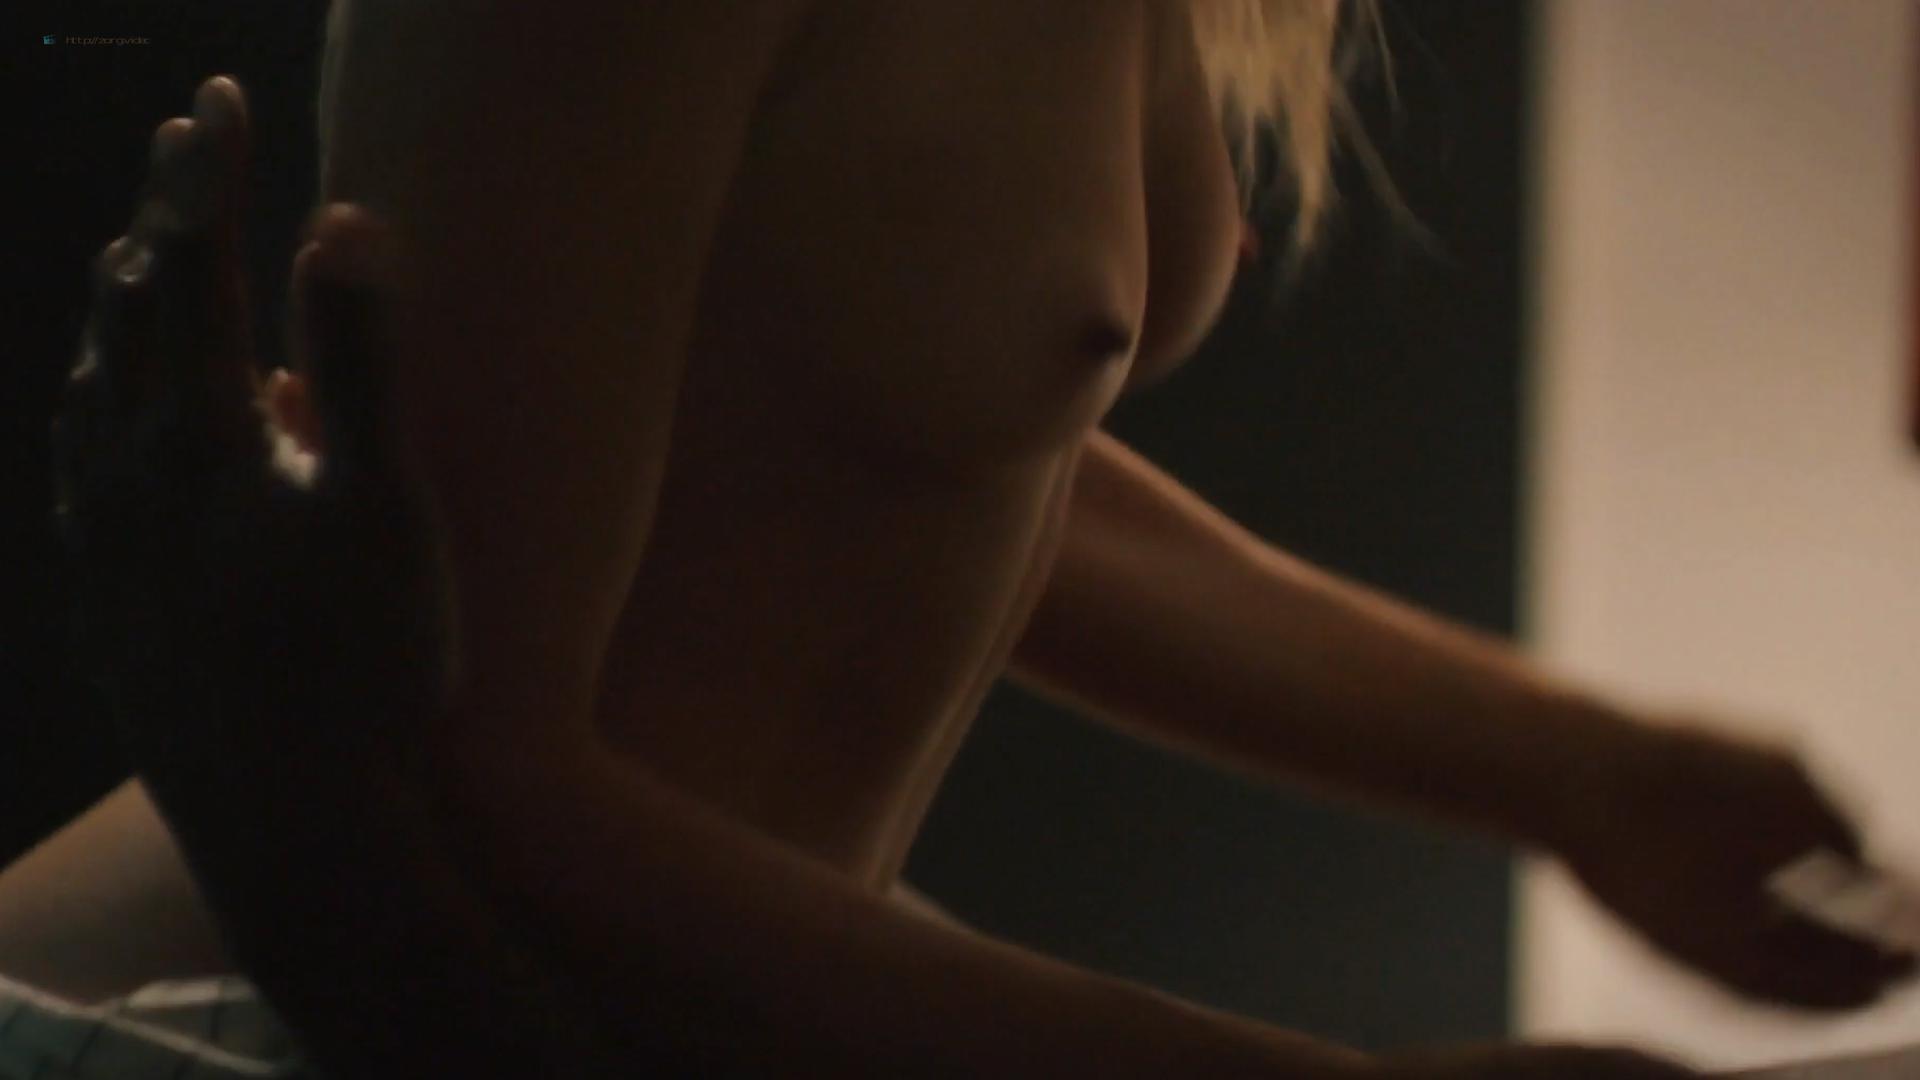 Lee Tomaschefski nude hot sex - 12 Rounds 3: Lockdown (2015) HD 1080p (3)